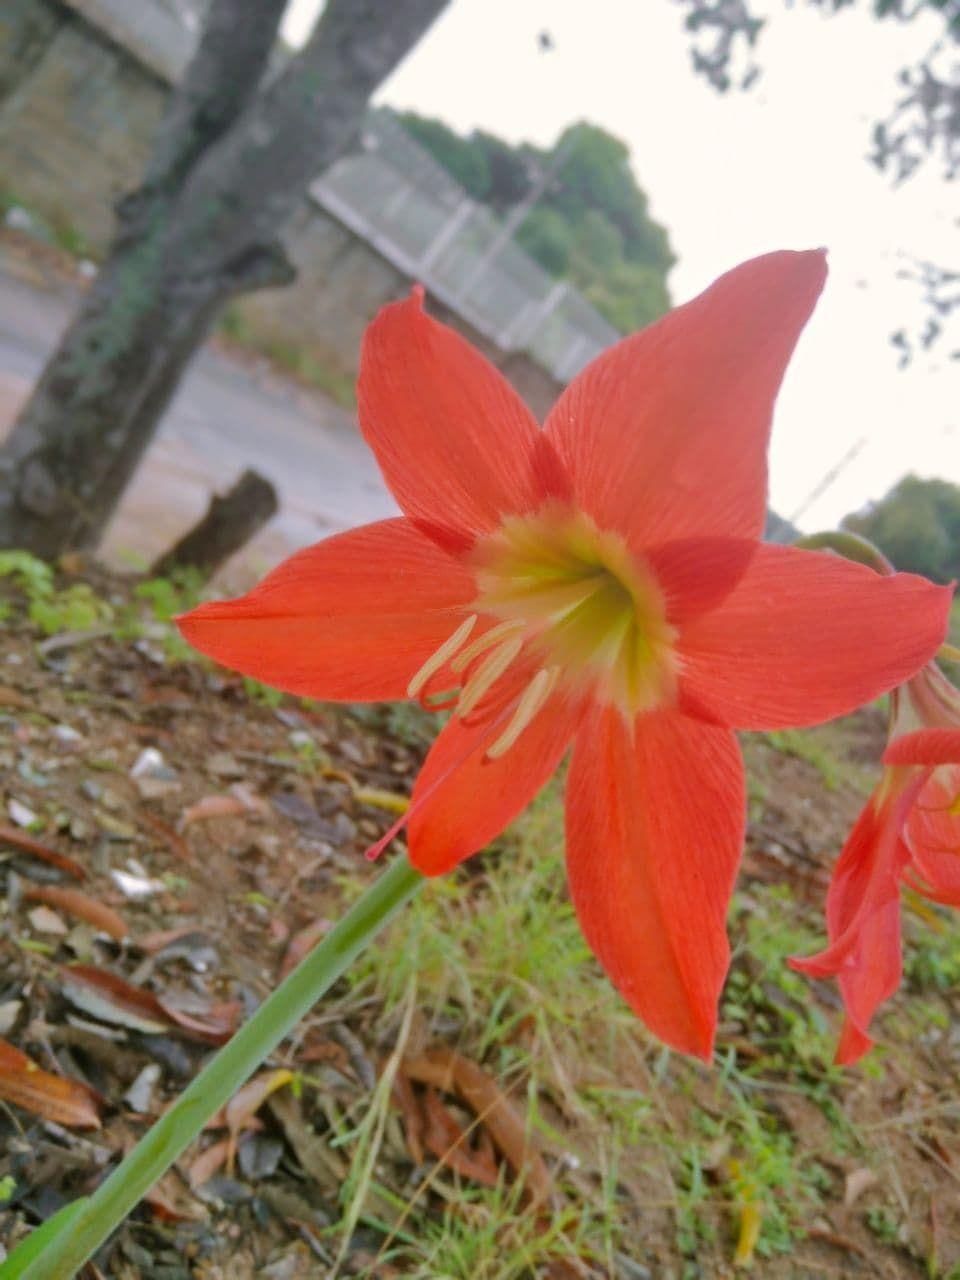 photo_2021-05-04_06-49-10.jpg